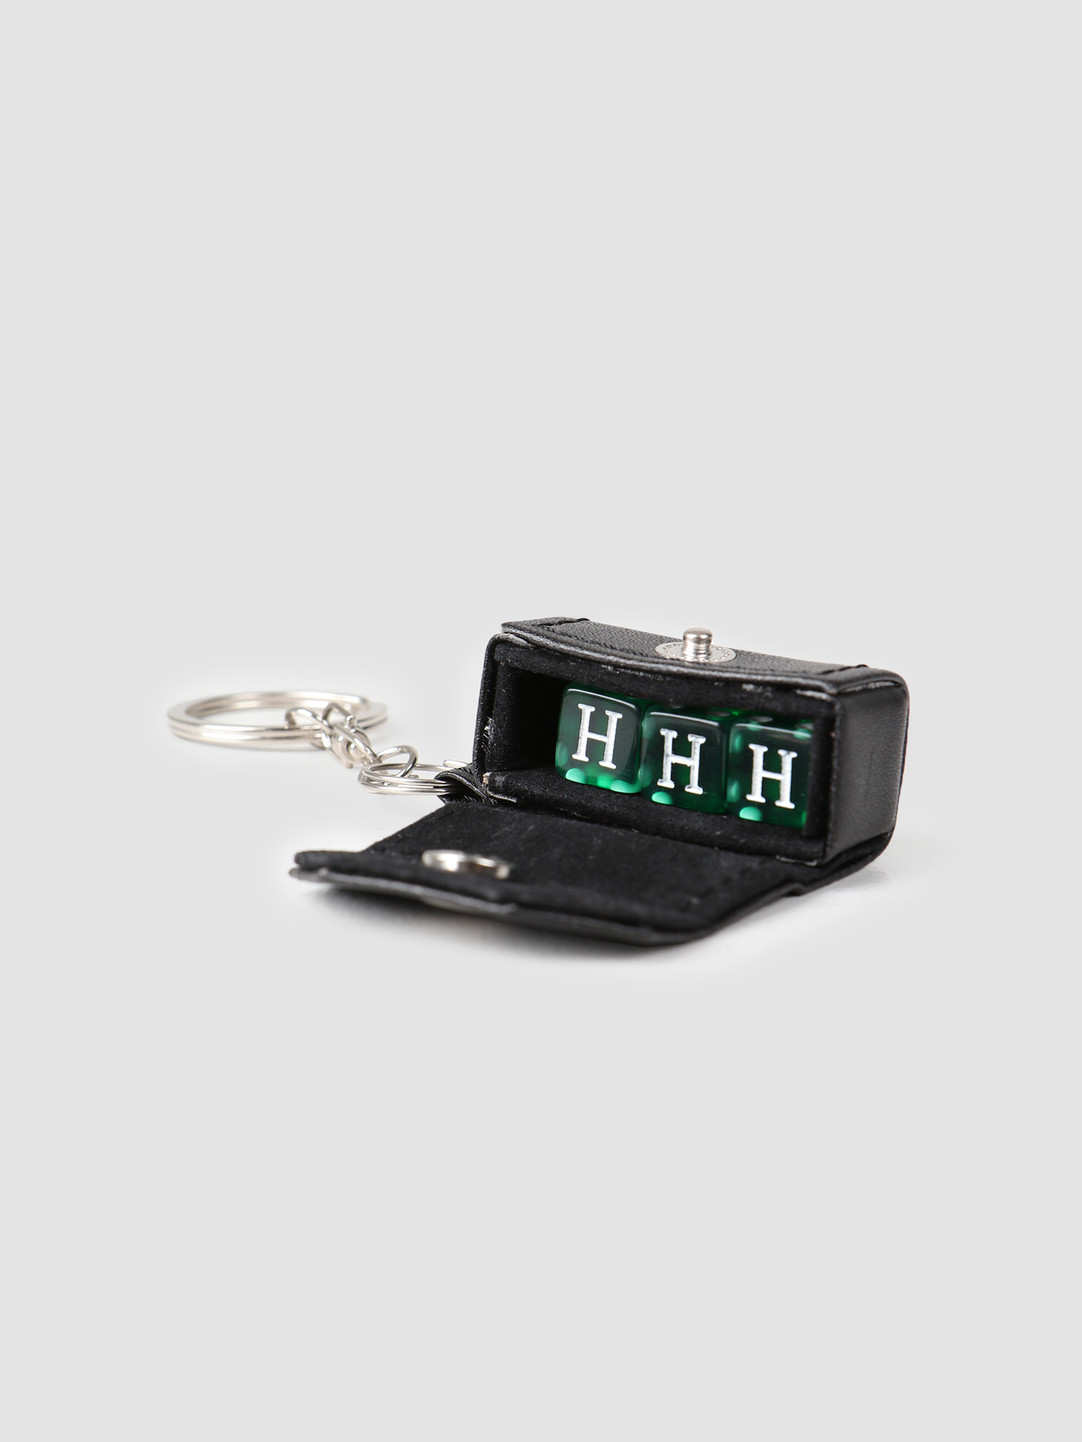 HUF HUF Cee-Lo Dice Keychain Black AC00177